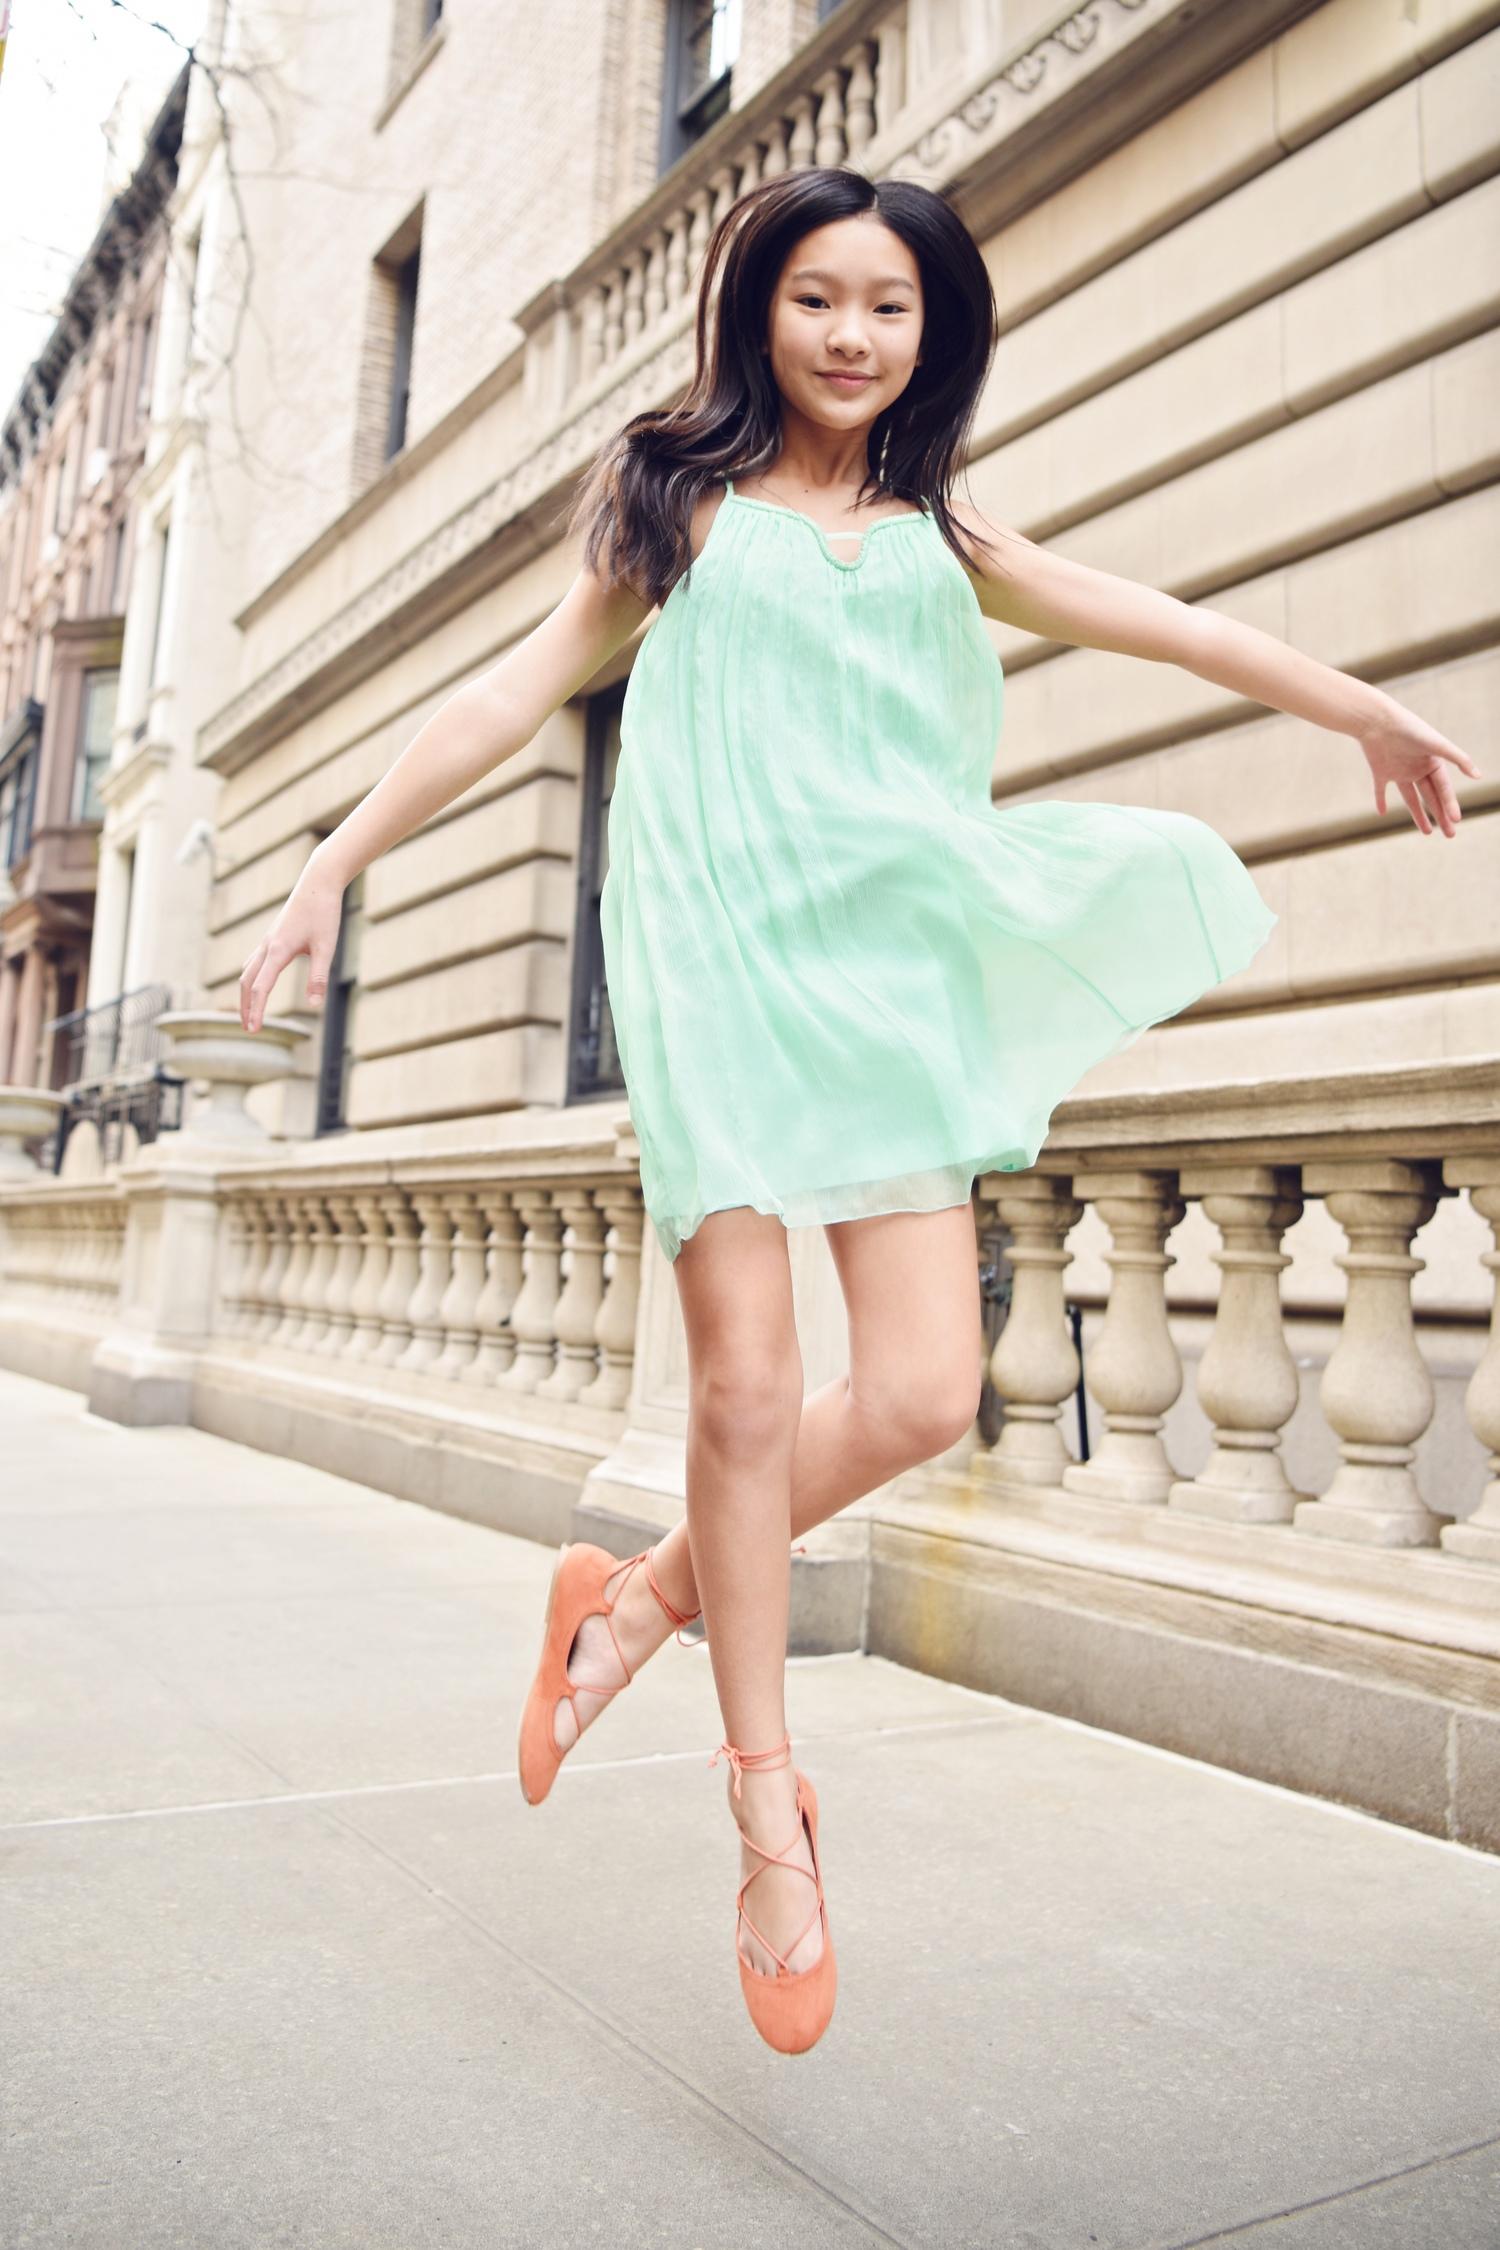 Enfant+Street+Style+by+Gina+Kim+Photography+Chloe+kids-1.jpeg